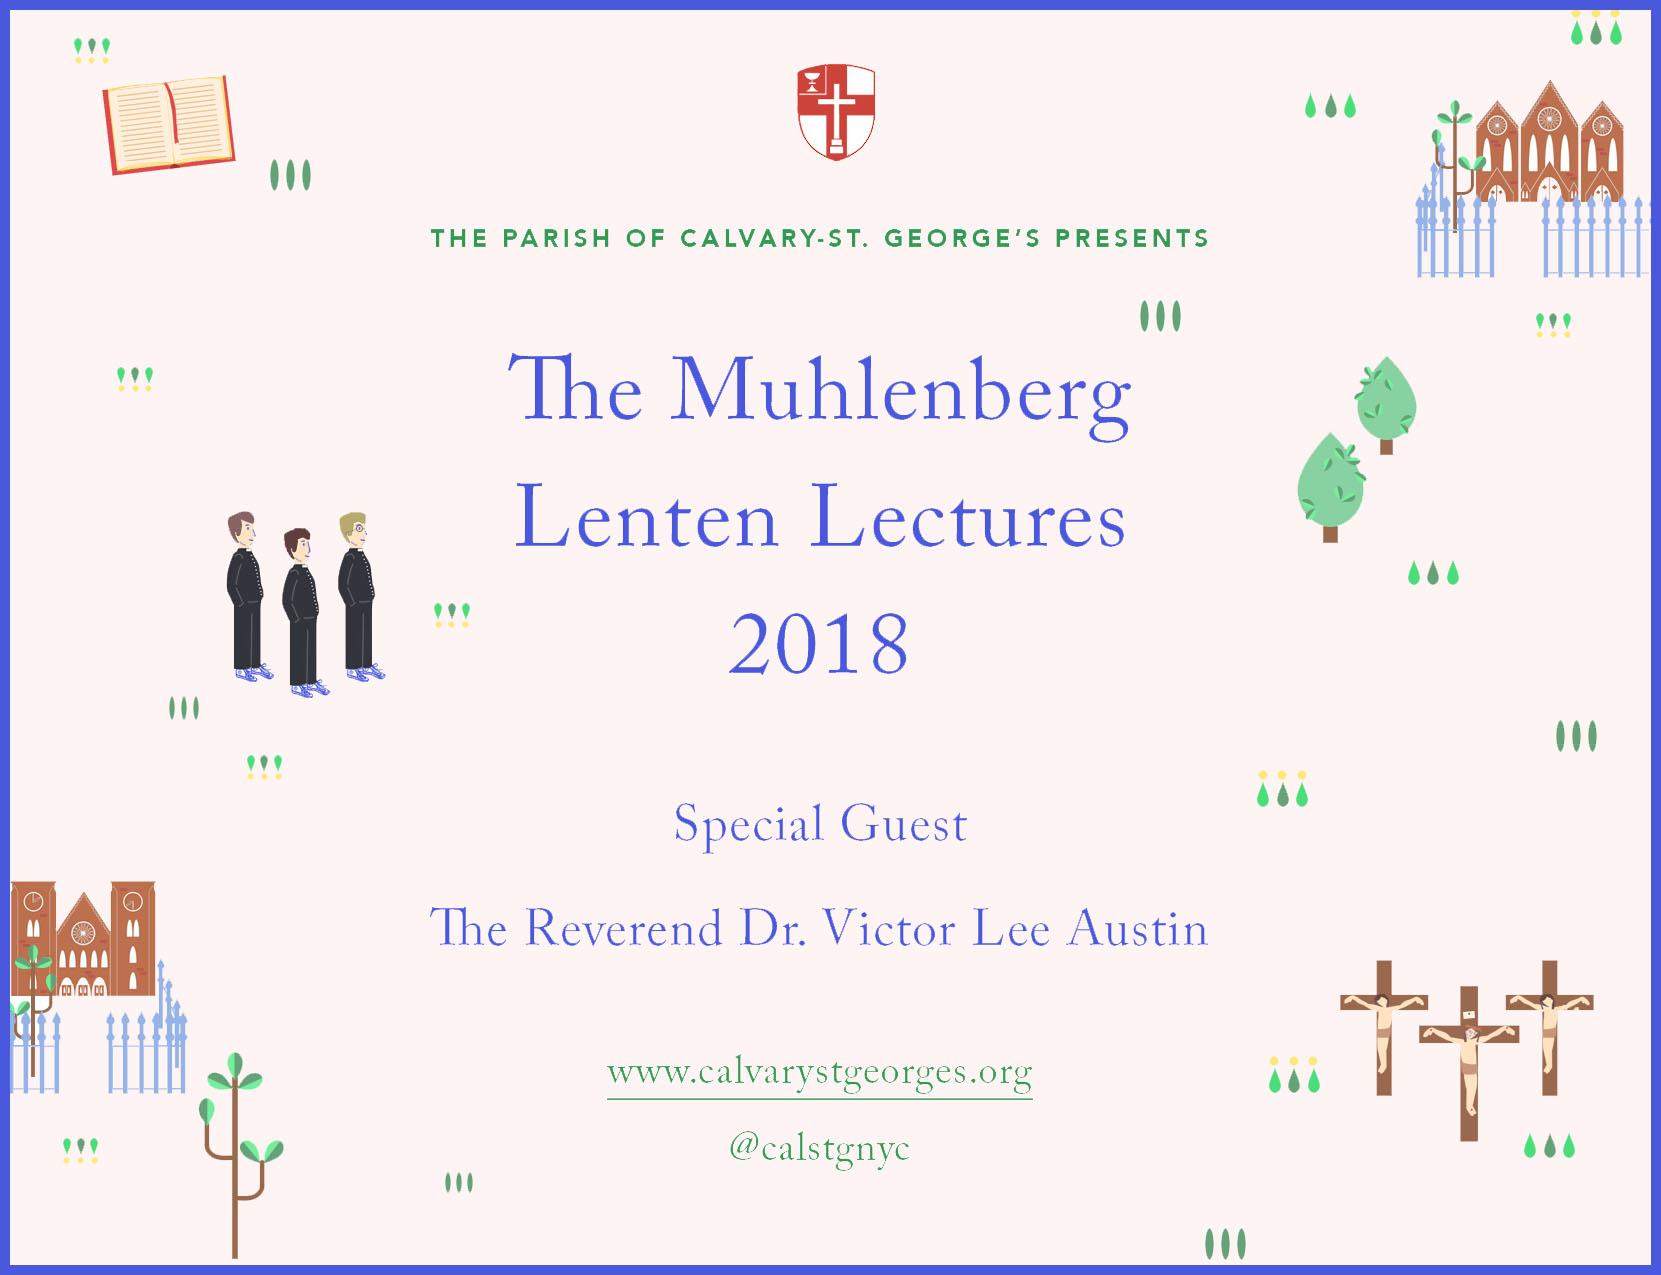 Postcard_Muhlenberg+Lectures_one.jpg